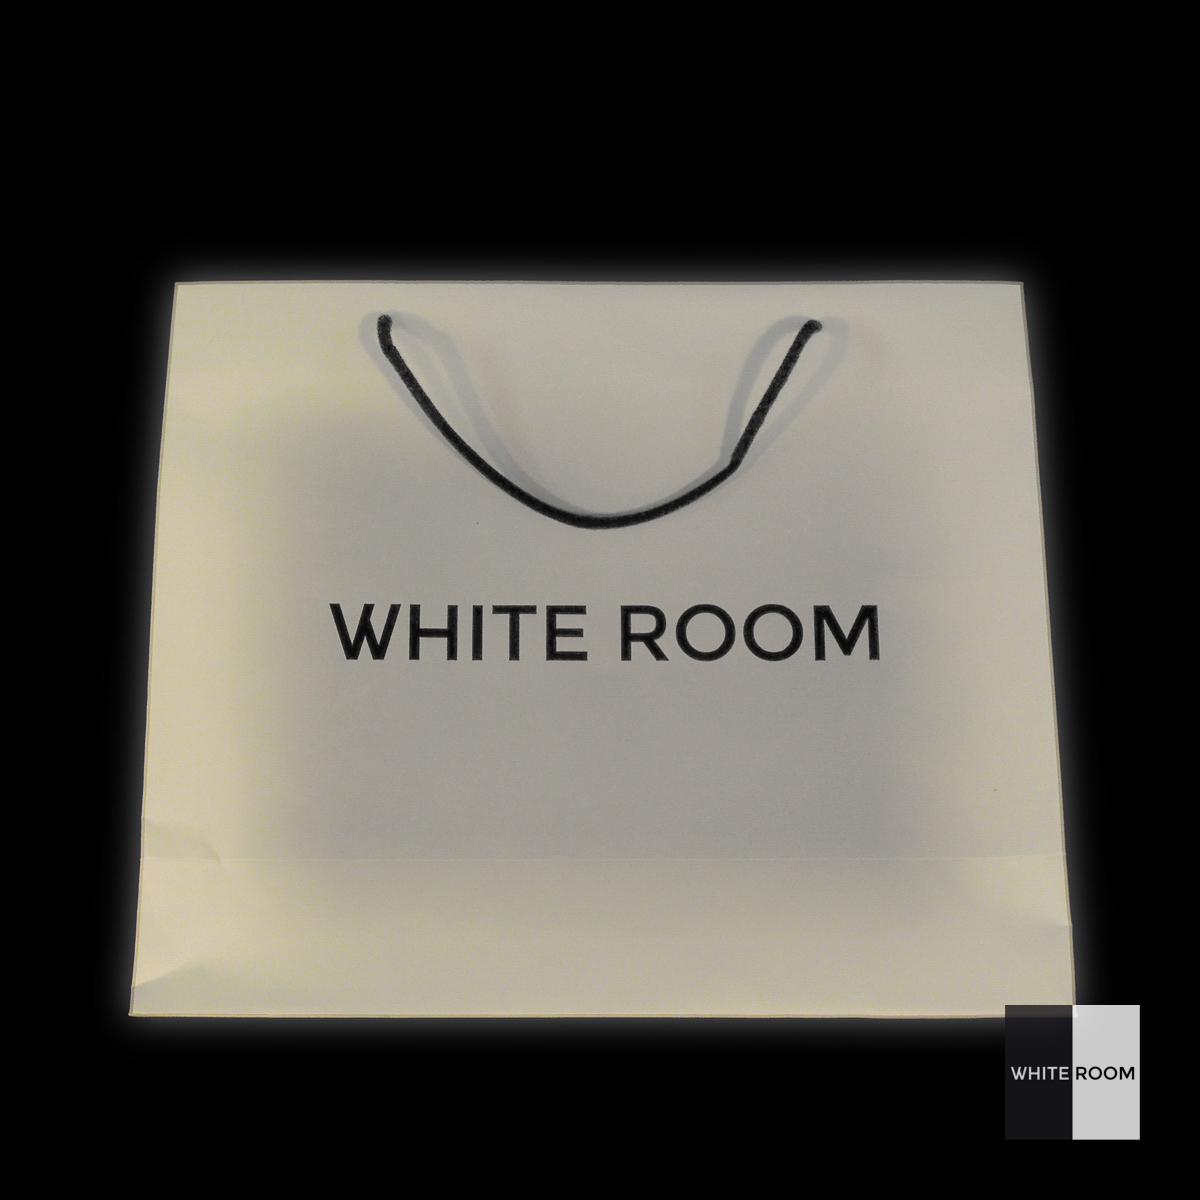 WHITEROOM fotoreportage